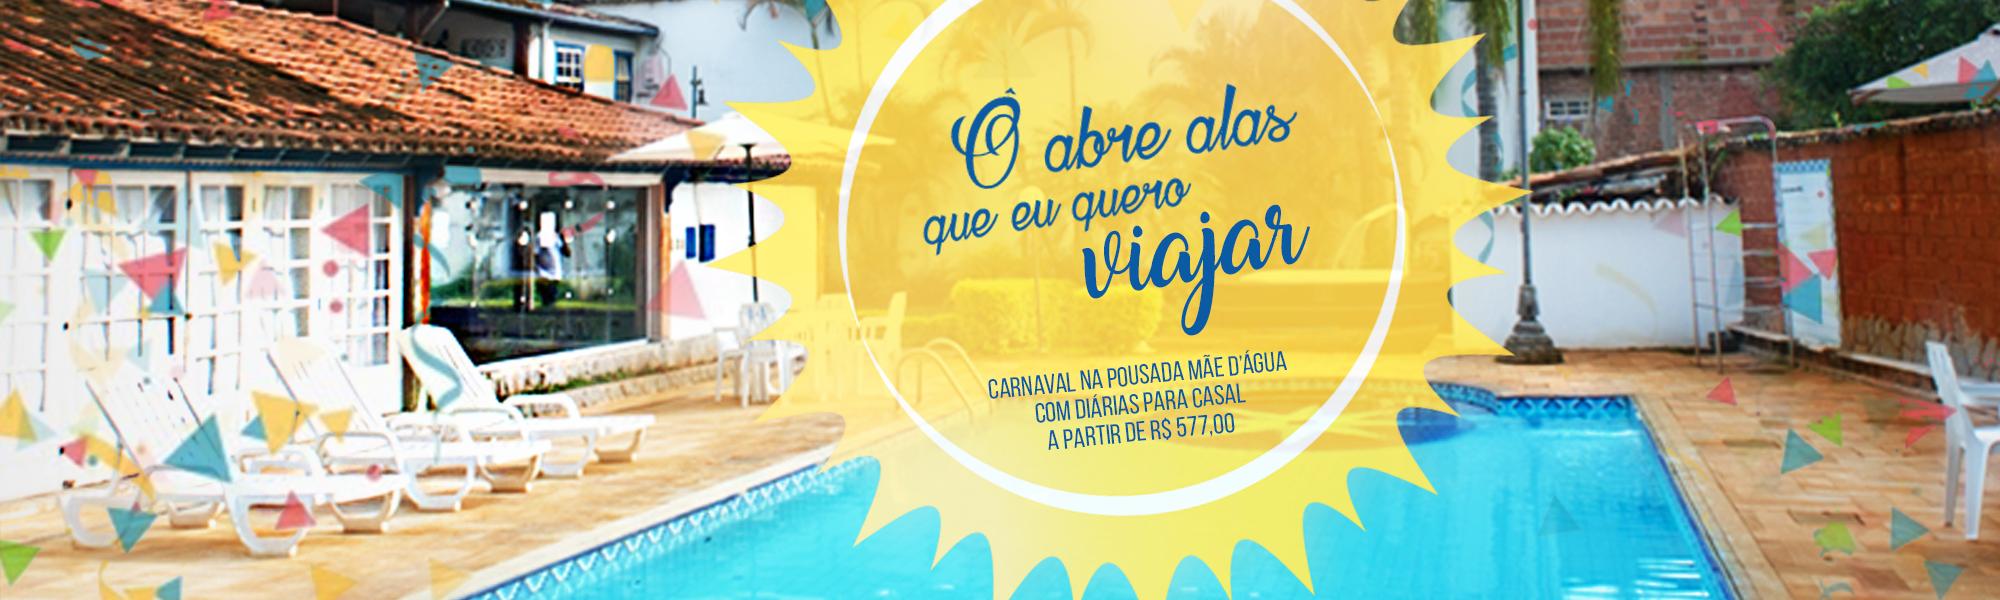 carnaval_pousada_mae_d_agua_tiradentes